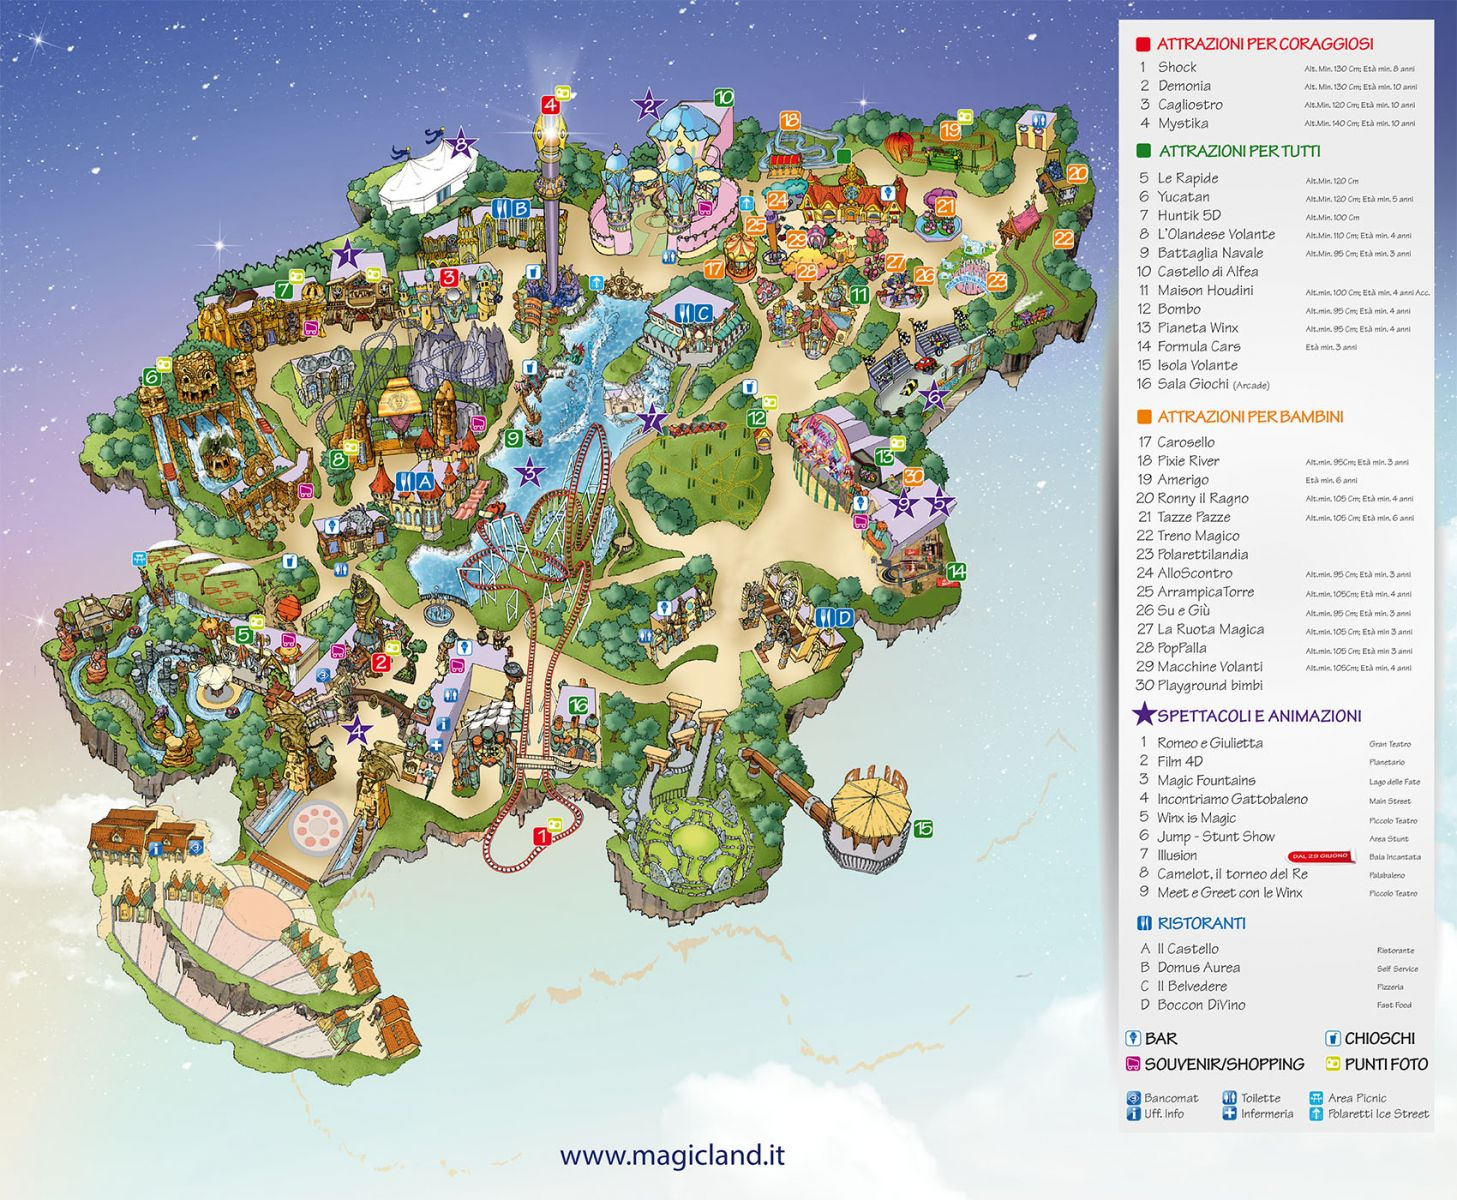 magic land Anime-magic-land.